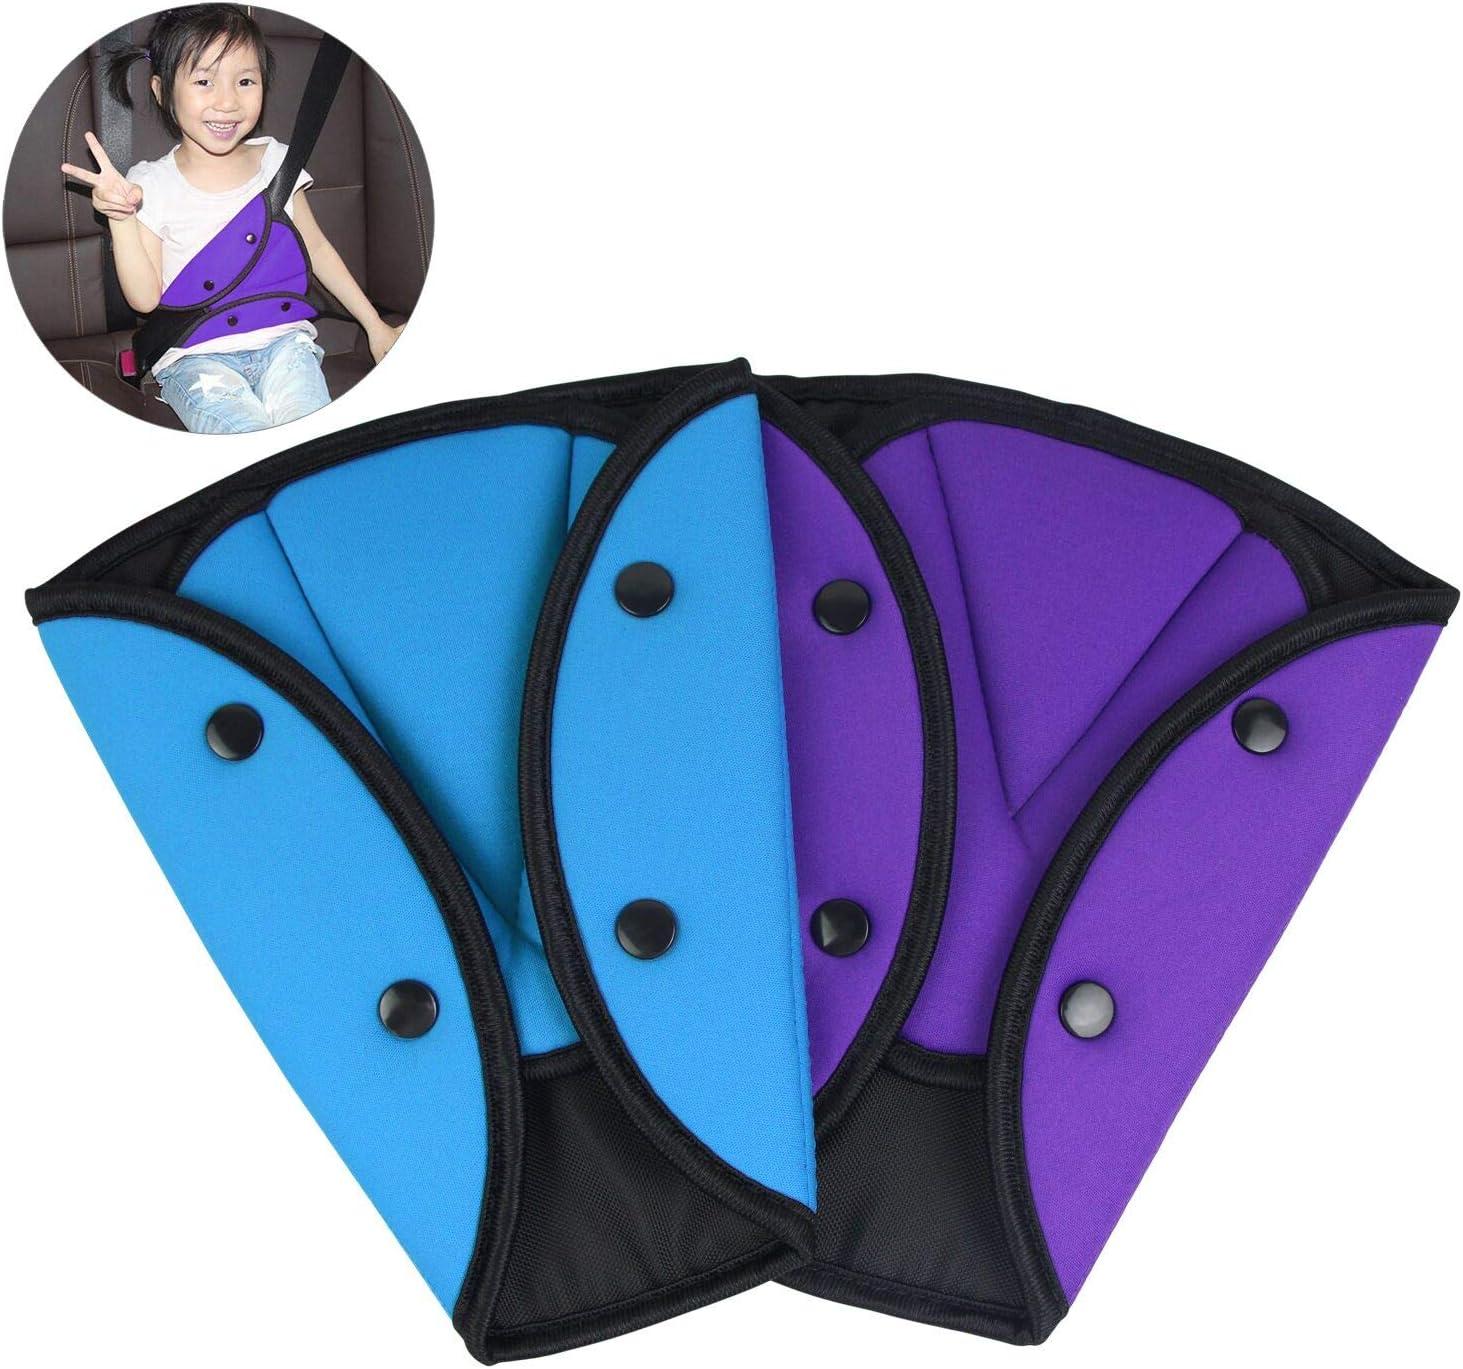 Kshcf Car Seatbelt Adjuster Triangle Safety Strap Protector Cushion Pad Adjuster,Blue